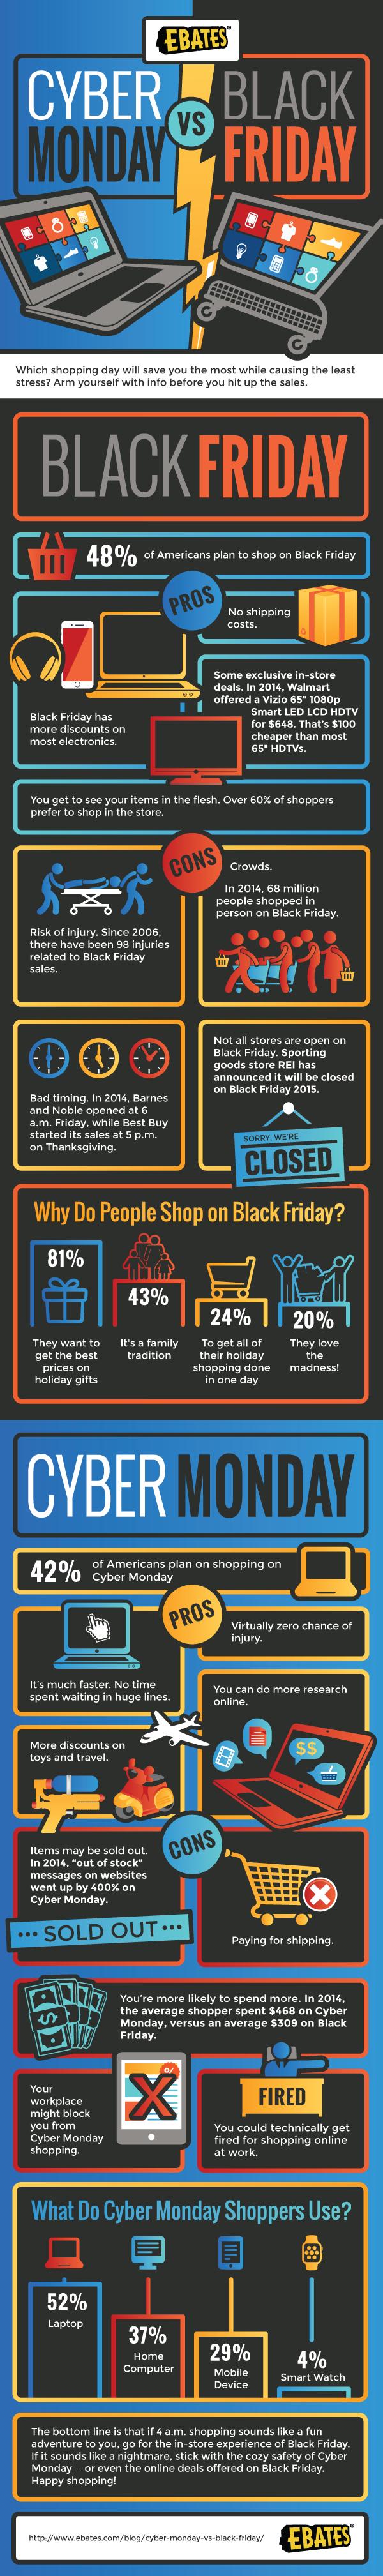 cyber-monday-vs-black-friday-infografia